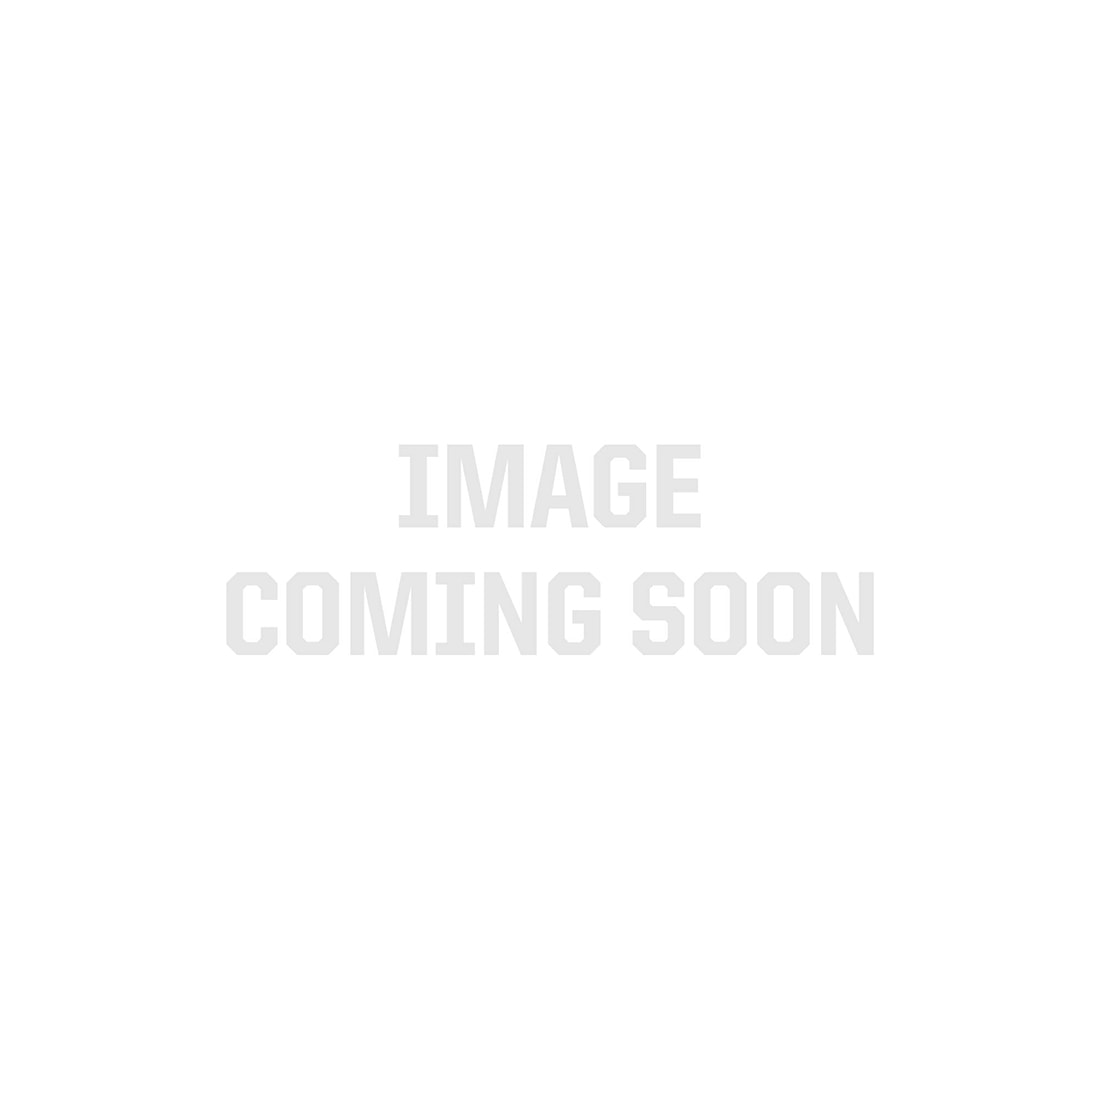 MicroMax VLB LED Driver - 12 VDC - 260W